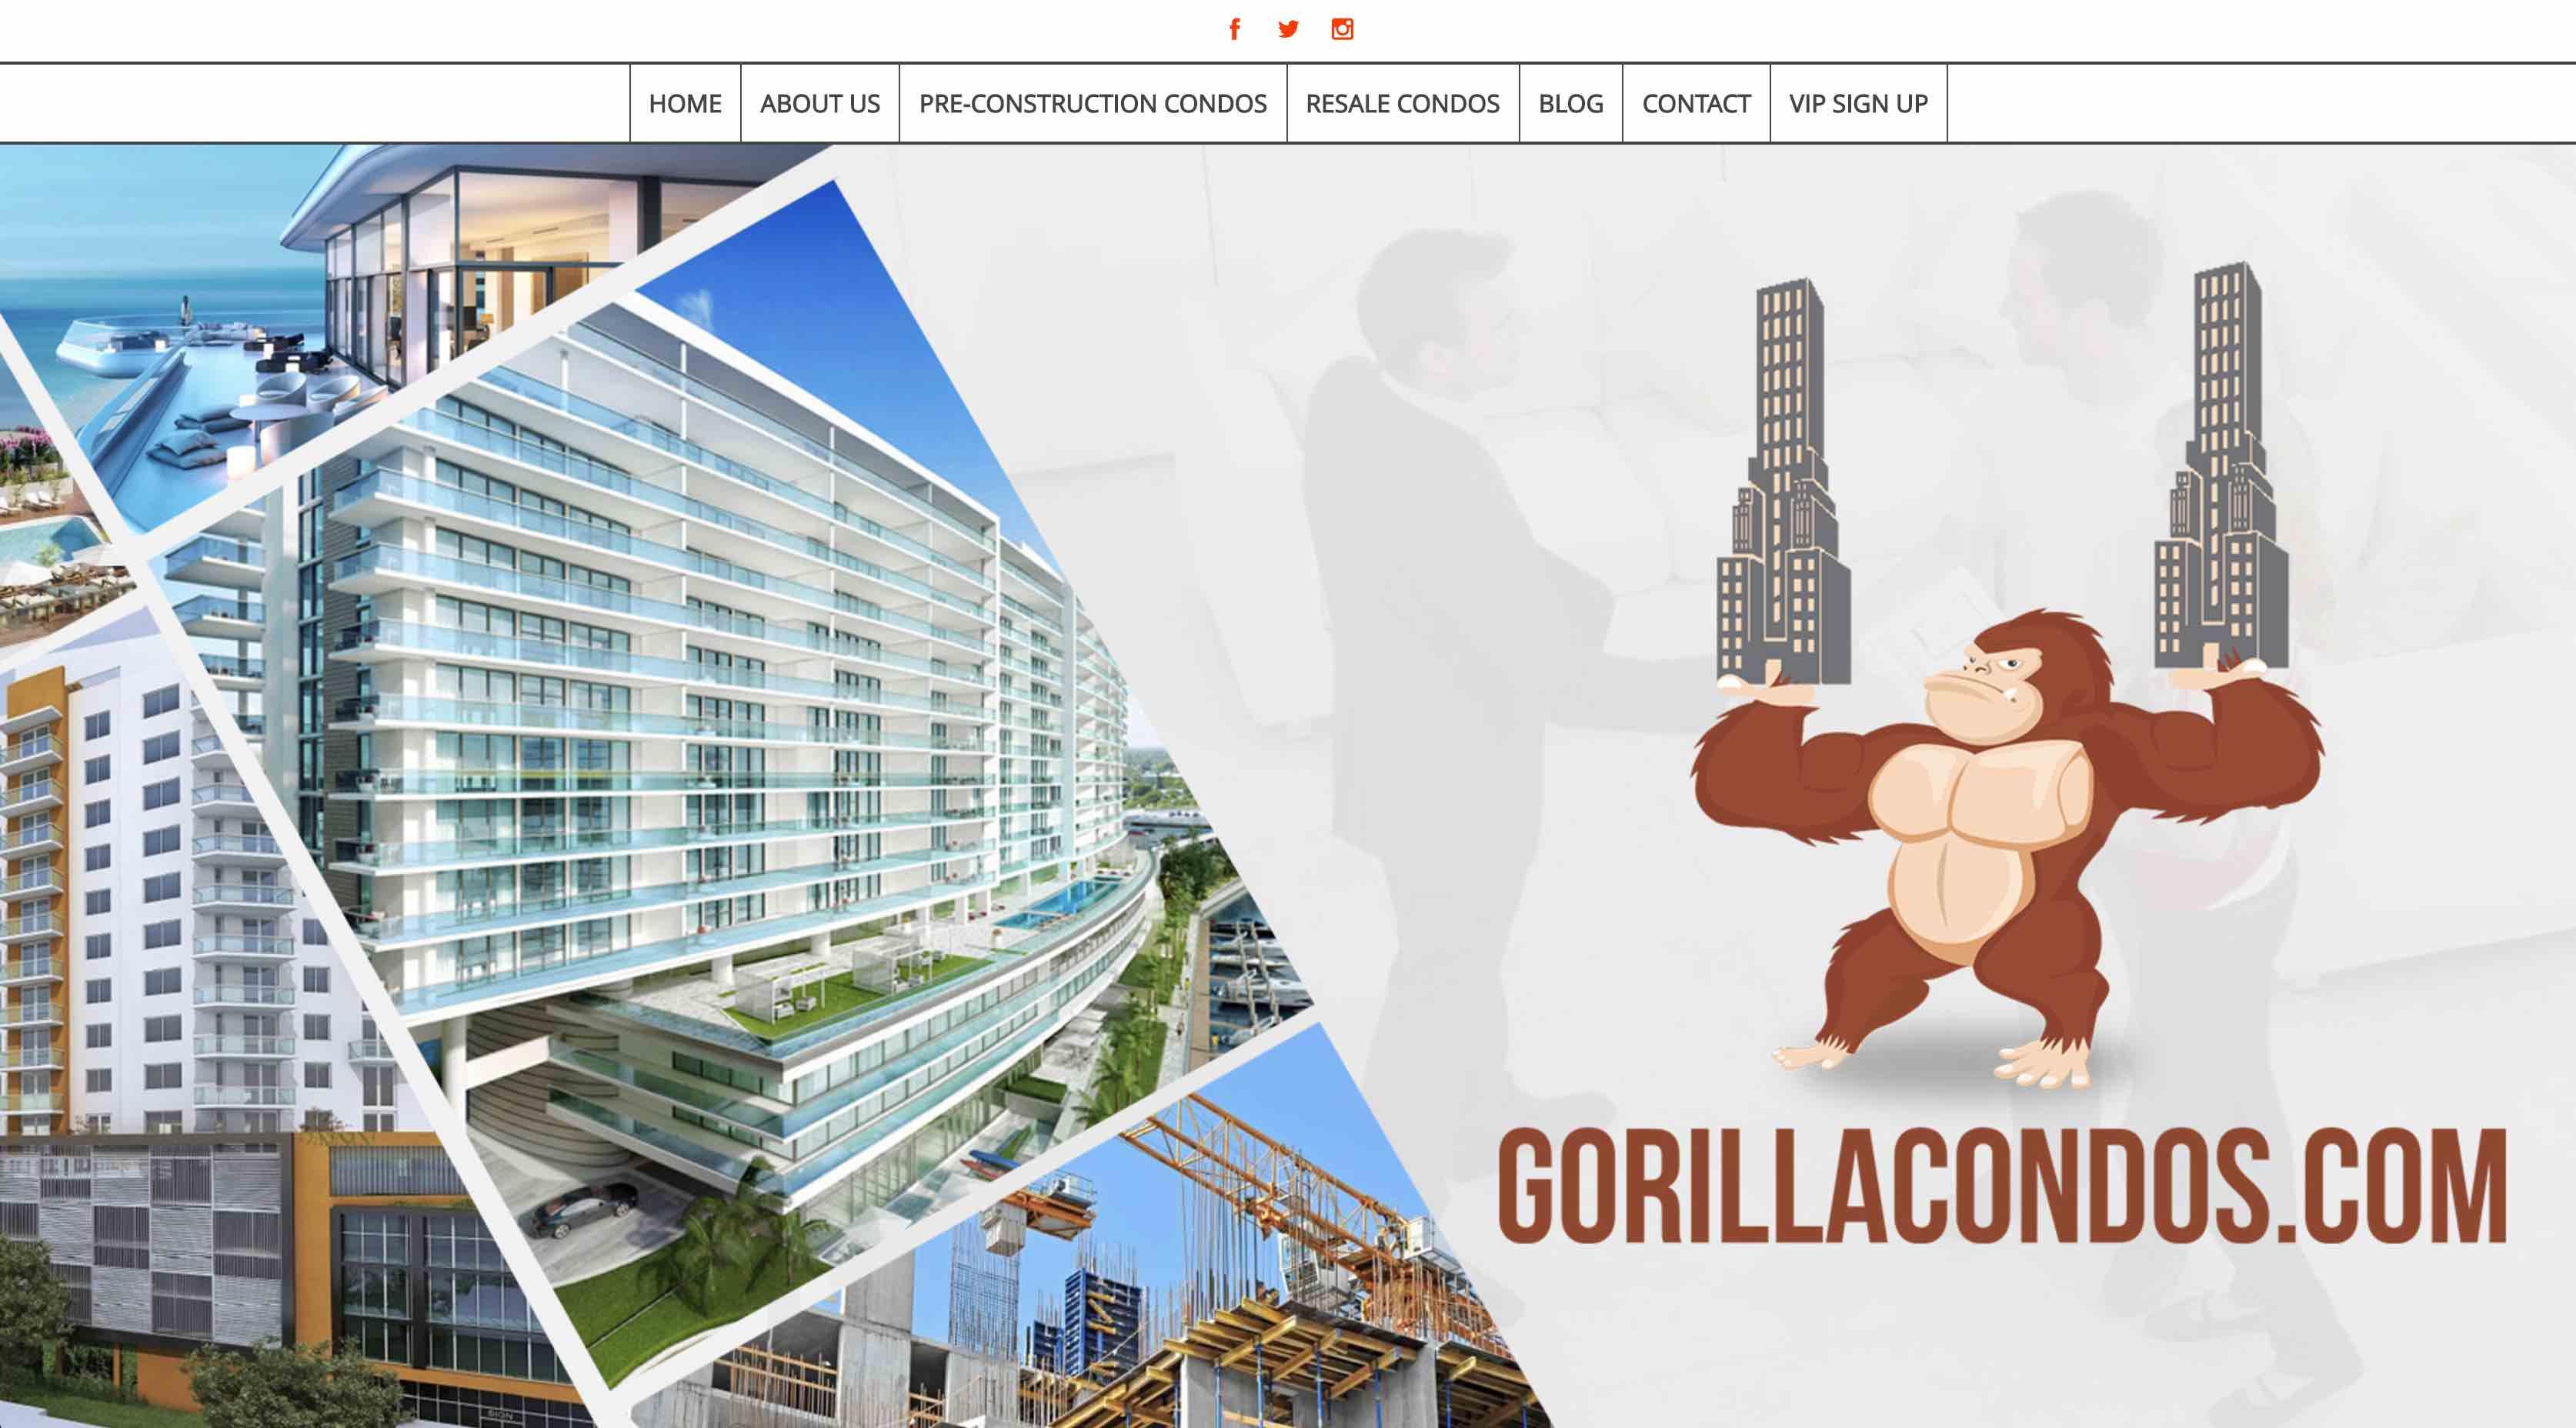 Gorilla Condos